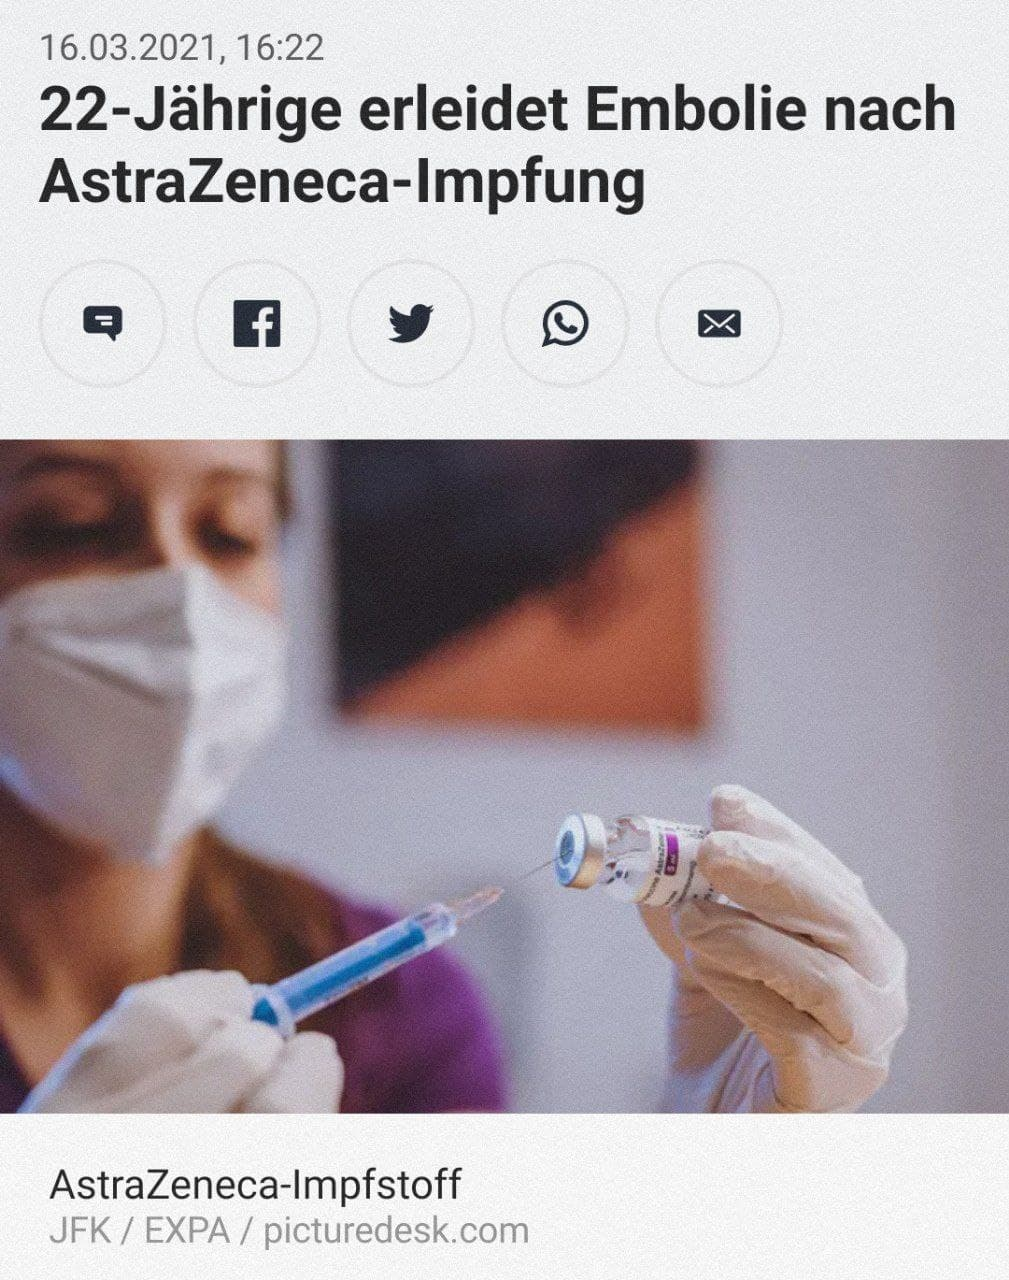 AstraZeneca Embolie